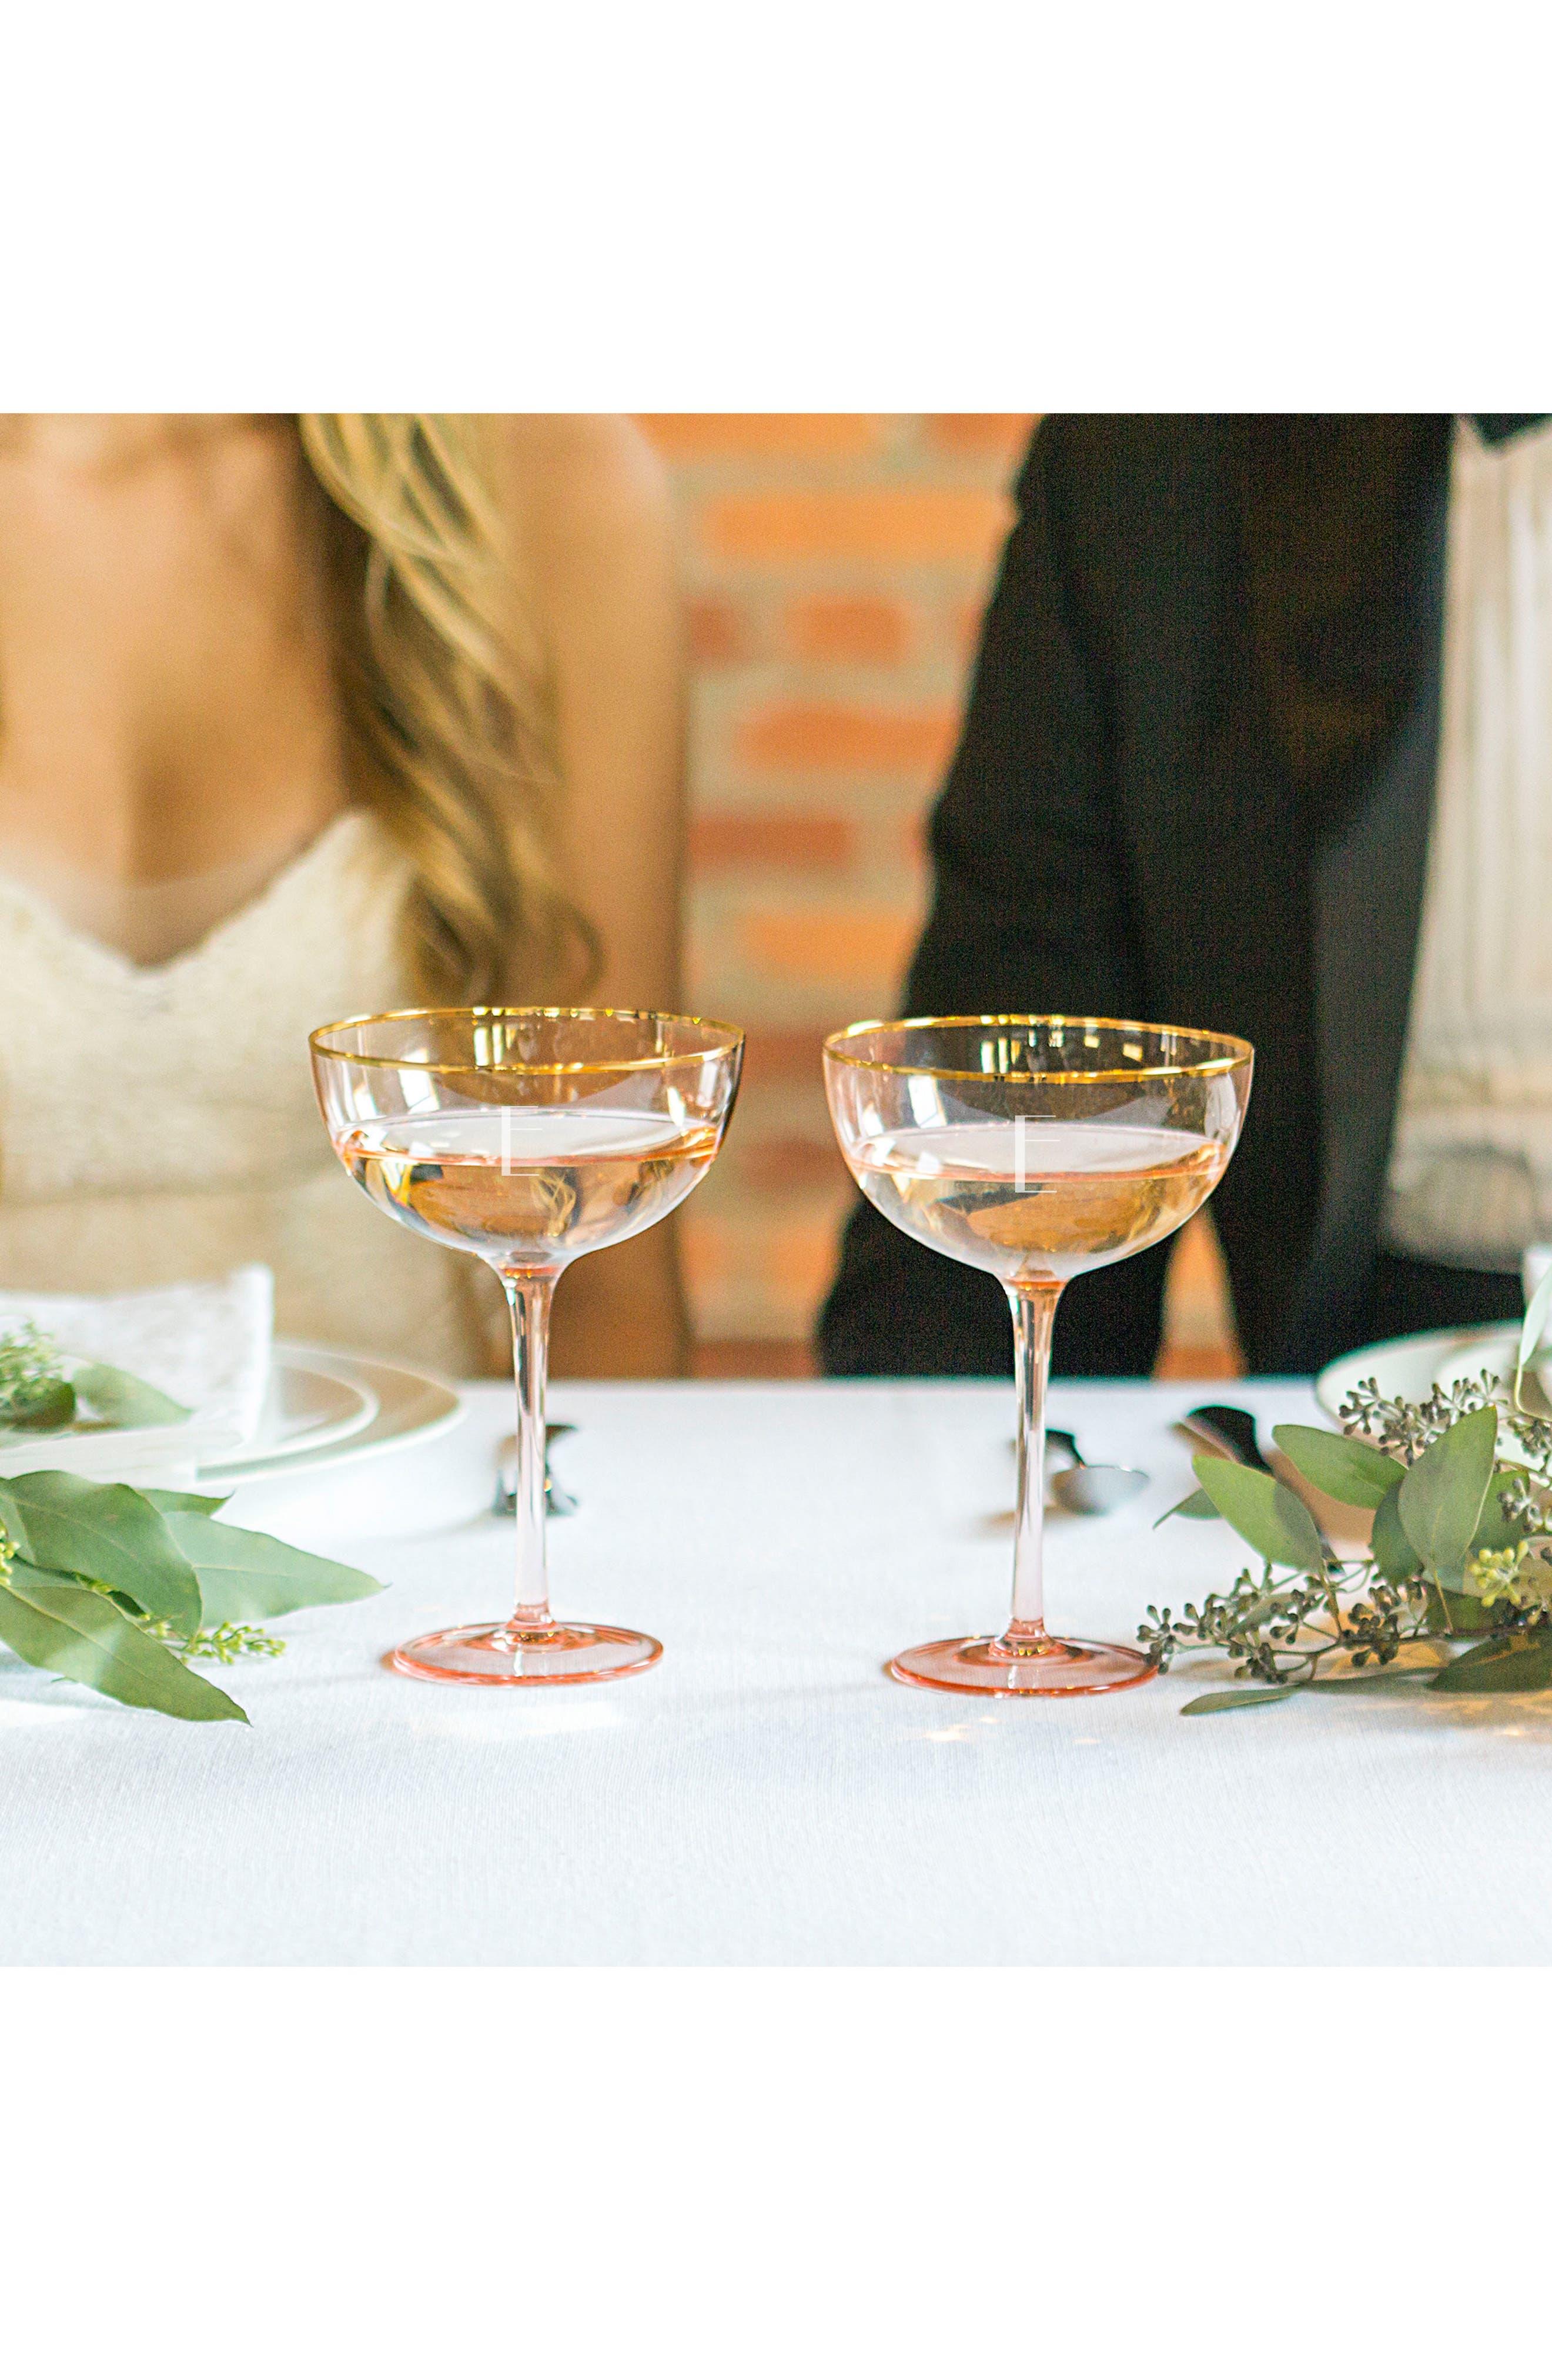 Monogram Set of 2 Champagne Coupes,                             Alternate thumbnail 3, color,                             Blush